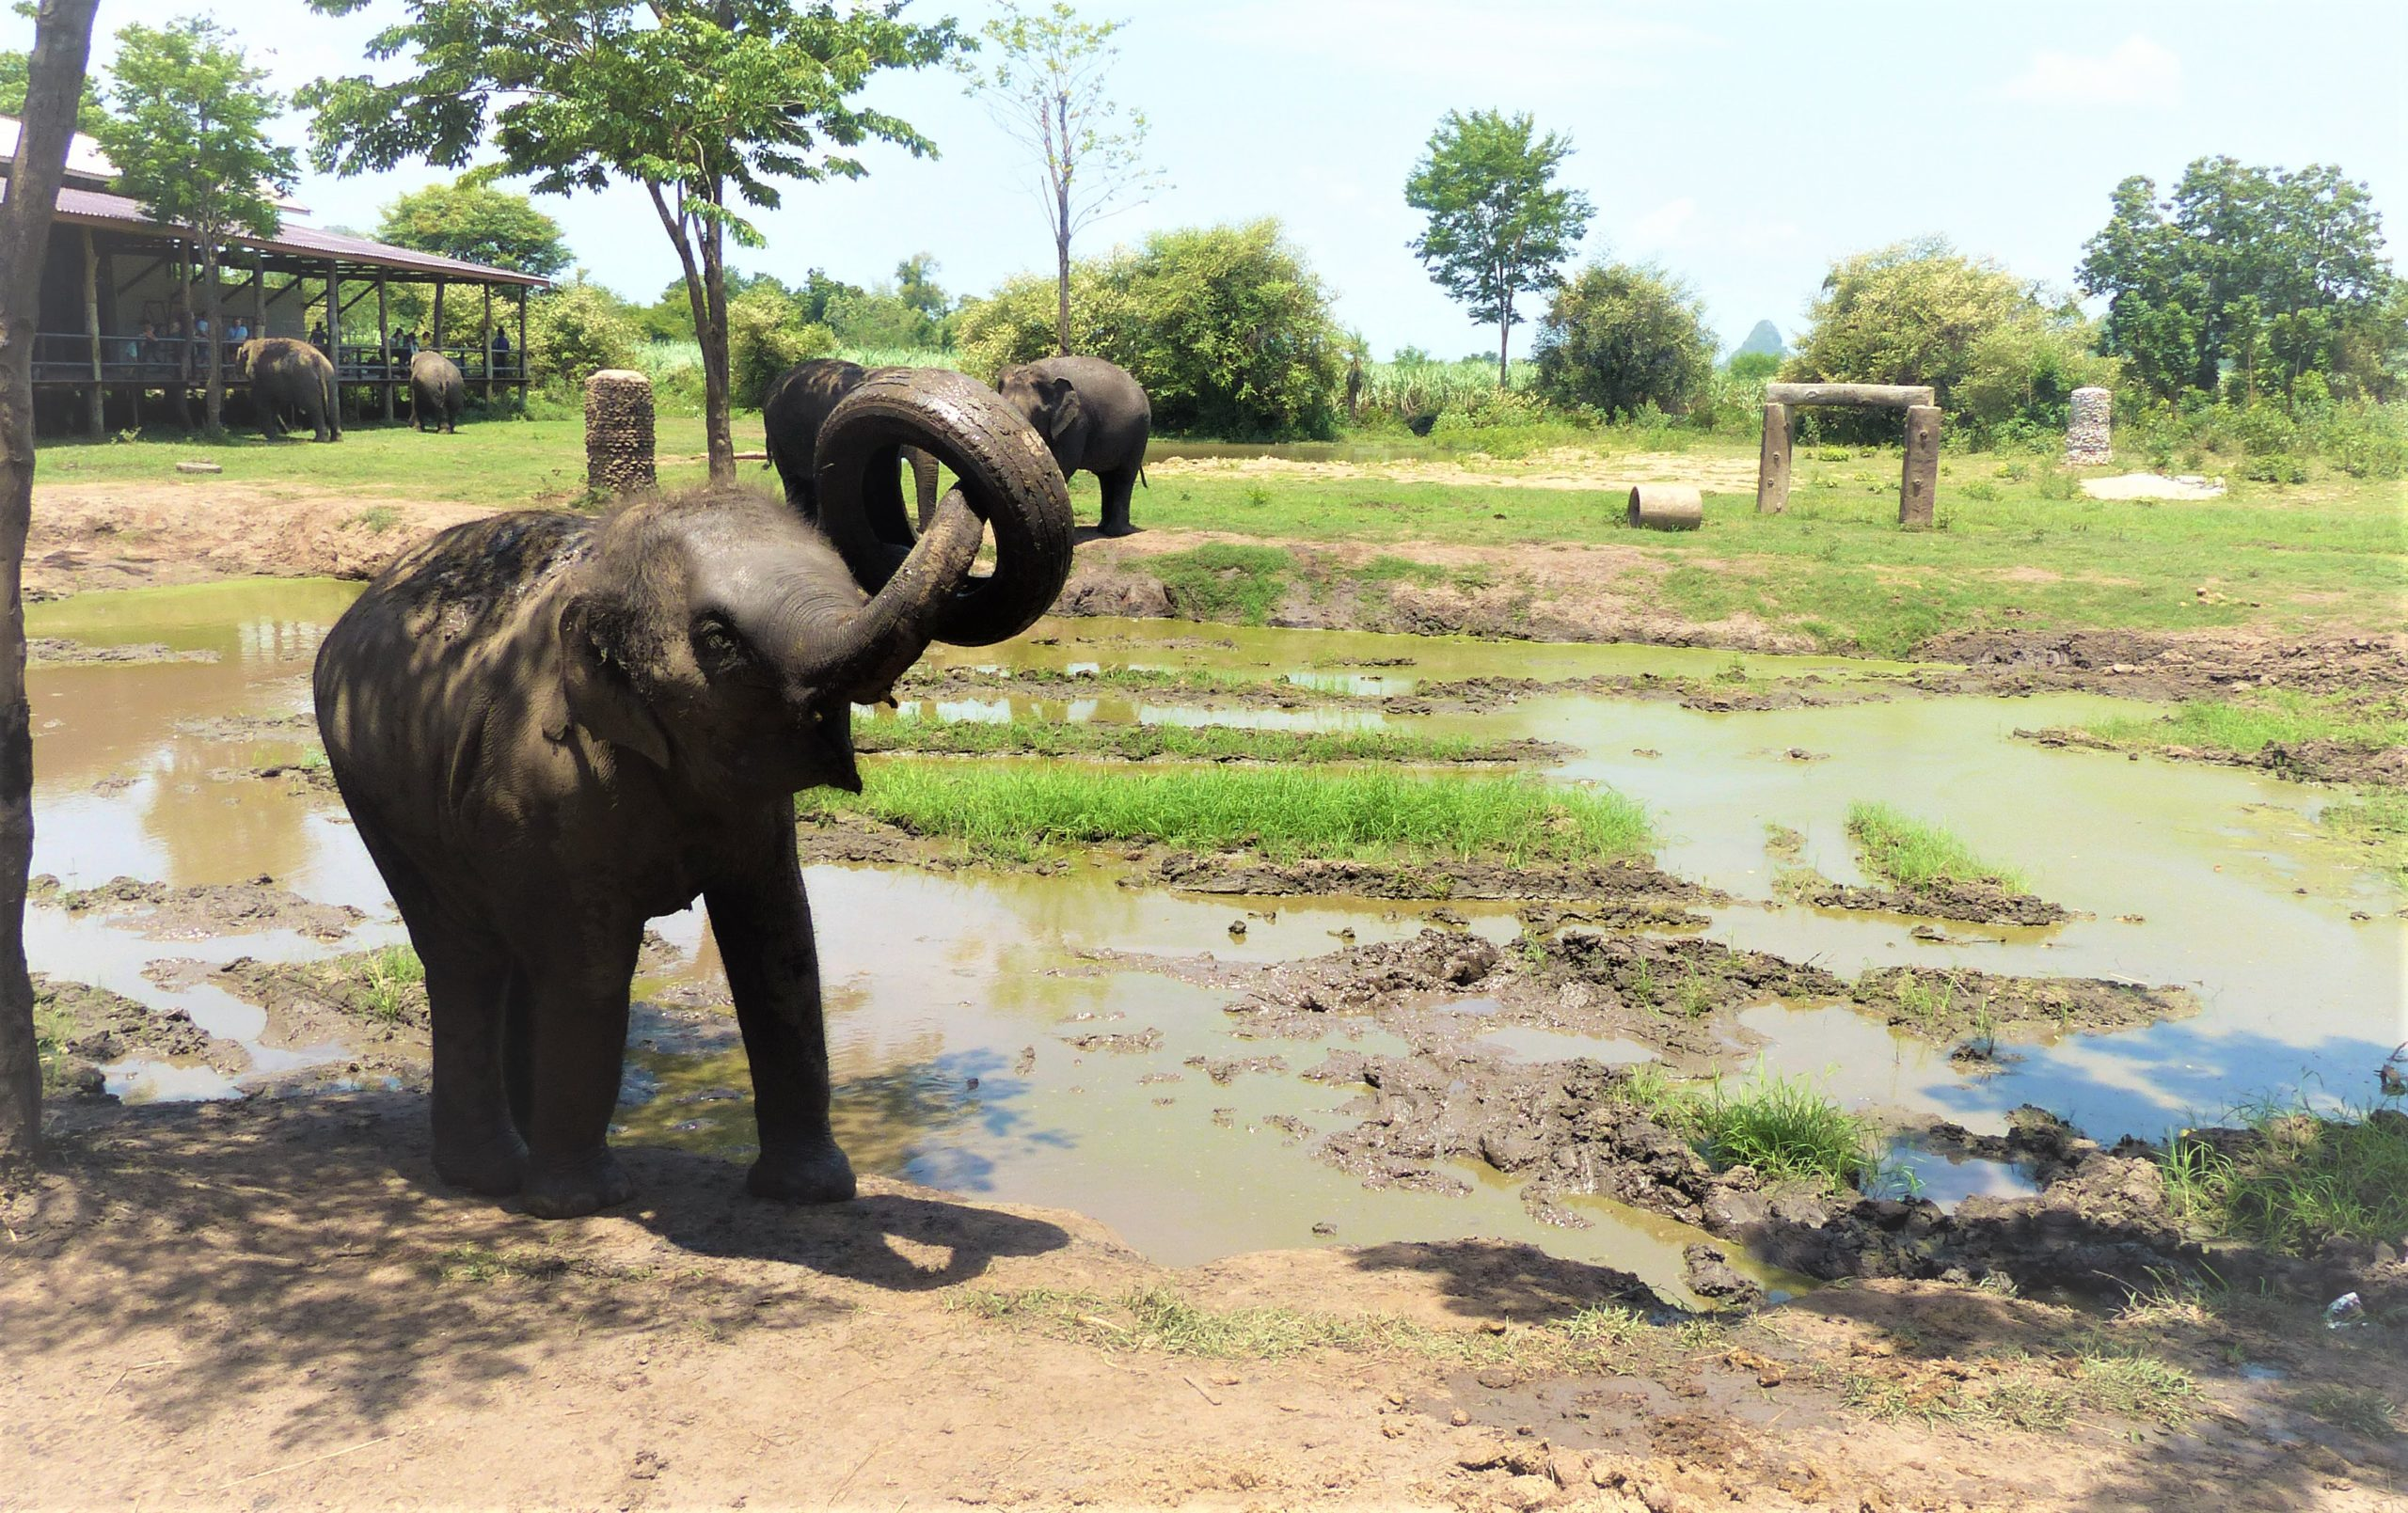 bain_boue_jeu_éléphant_bébé_thailande_elephants_world_kanchanaburi_asie